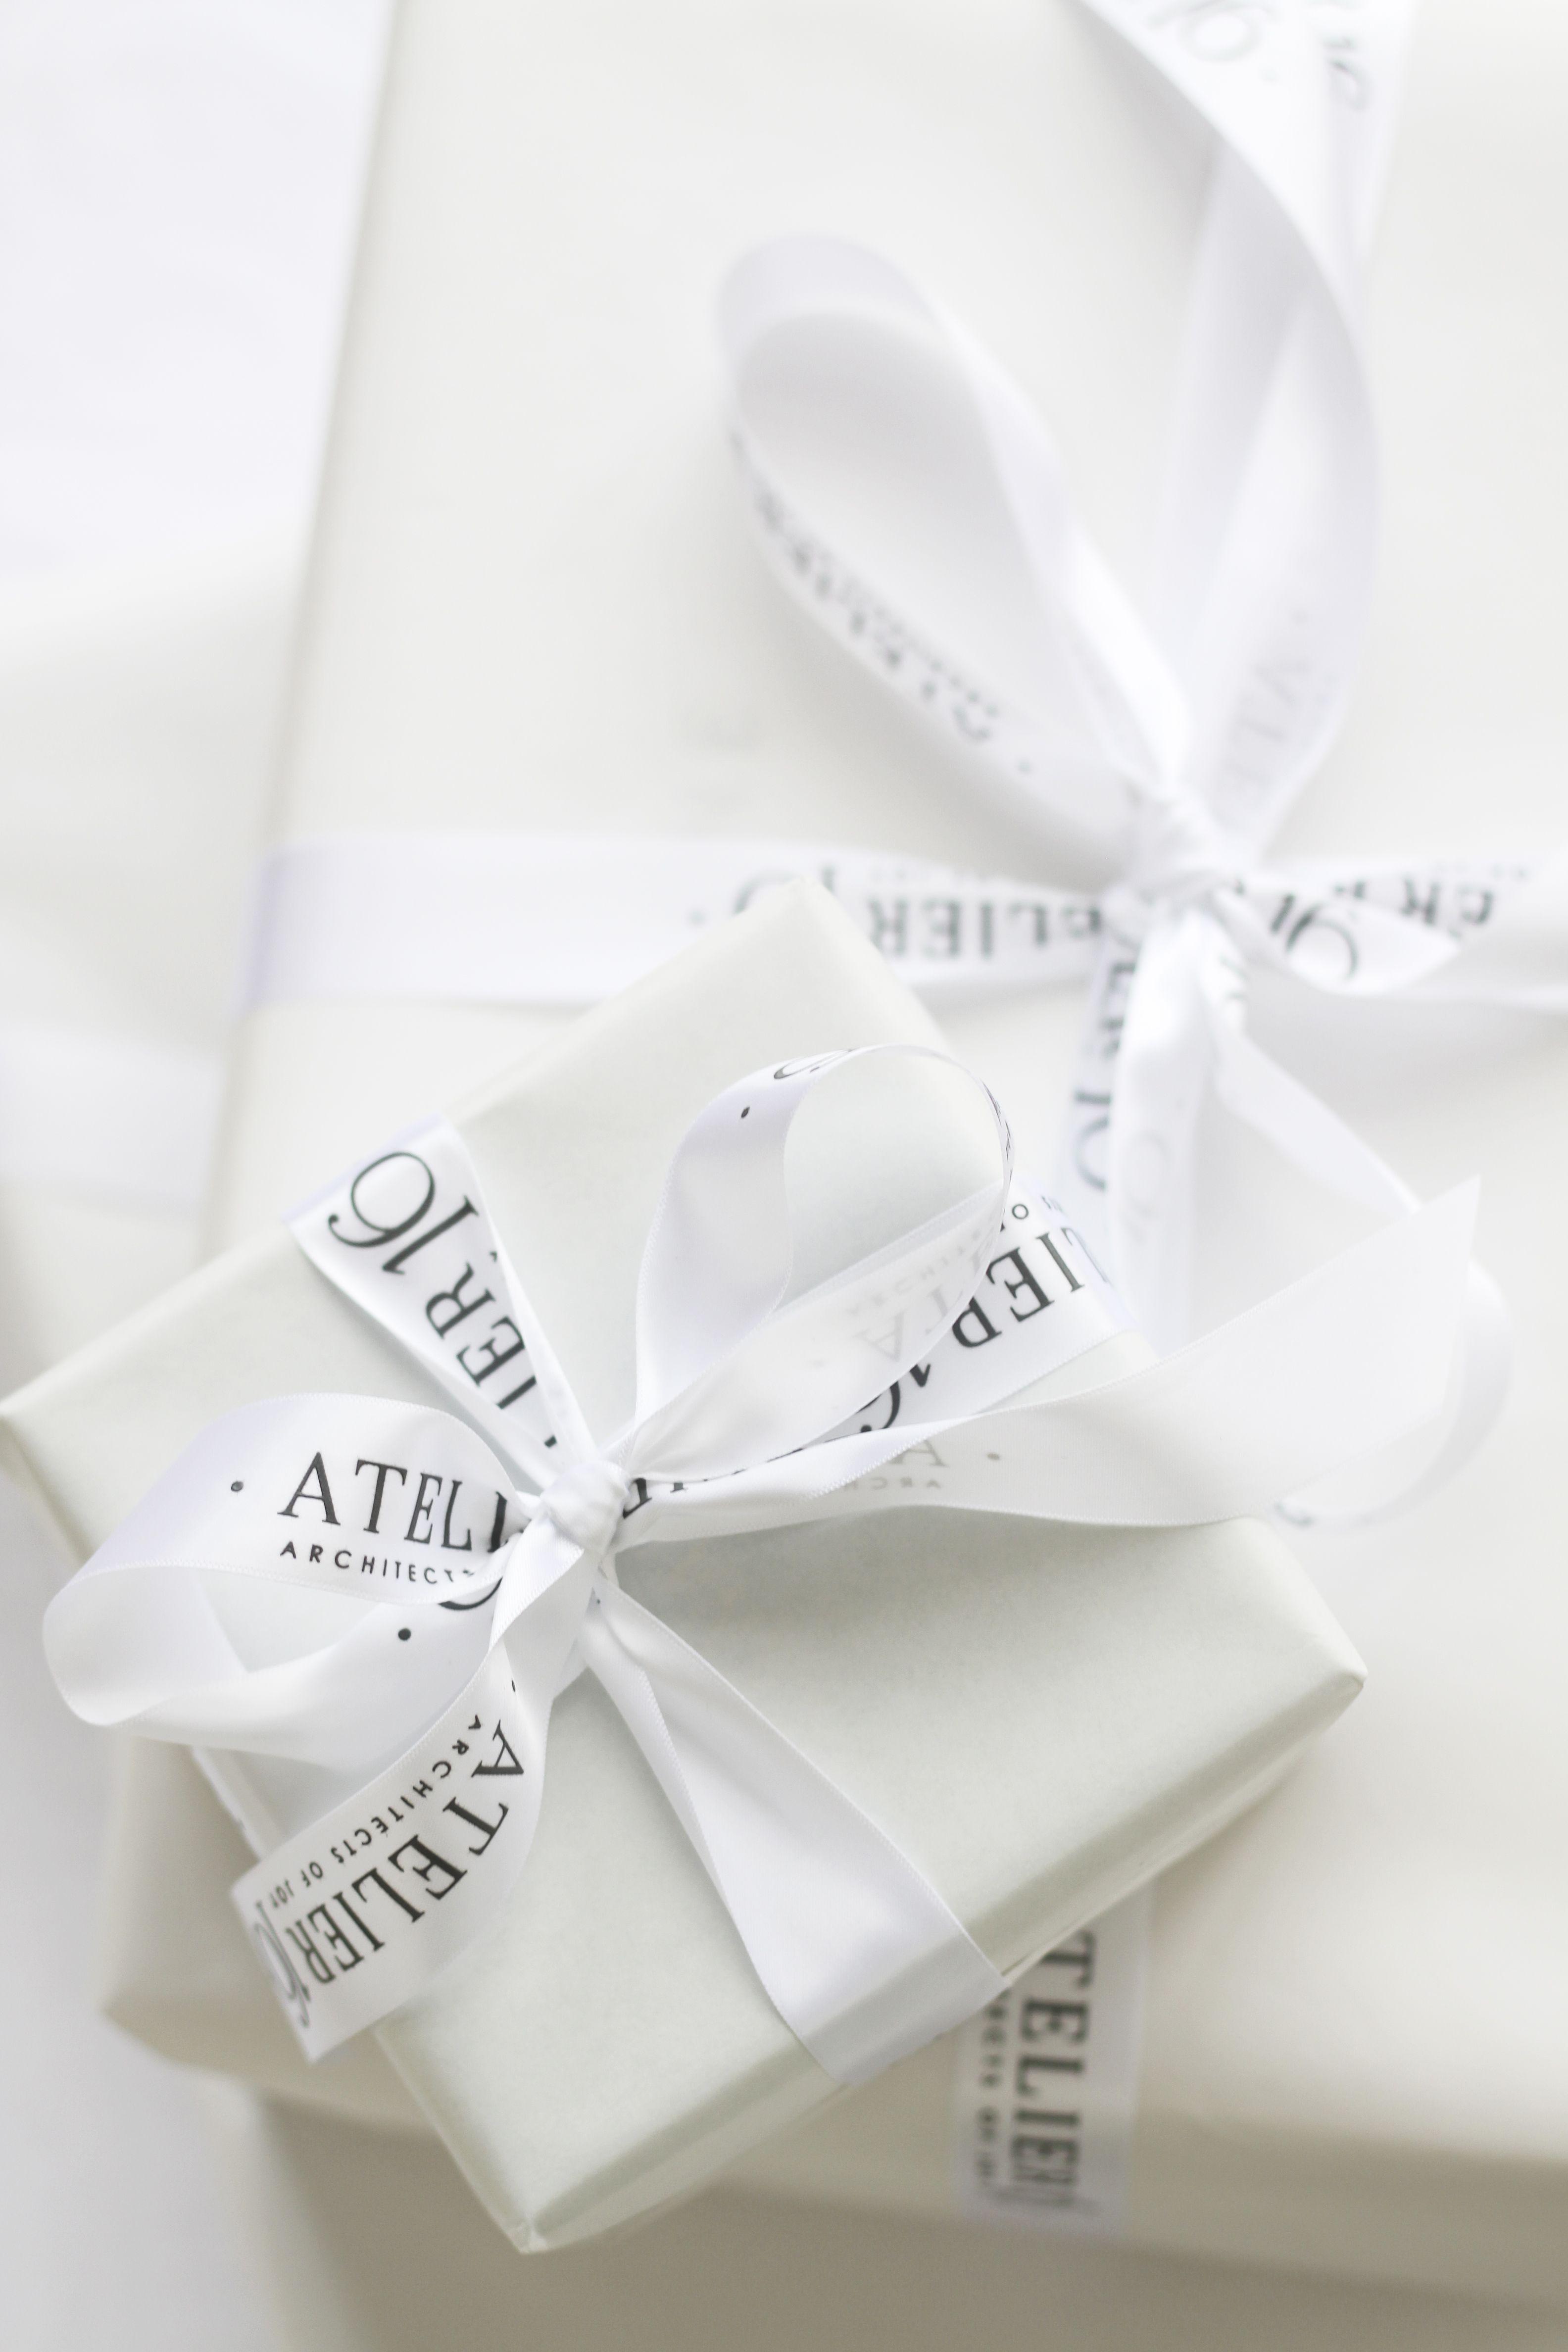 Wedding gift registry. Сервис по созданию вишлистов